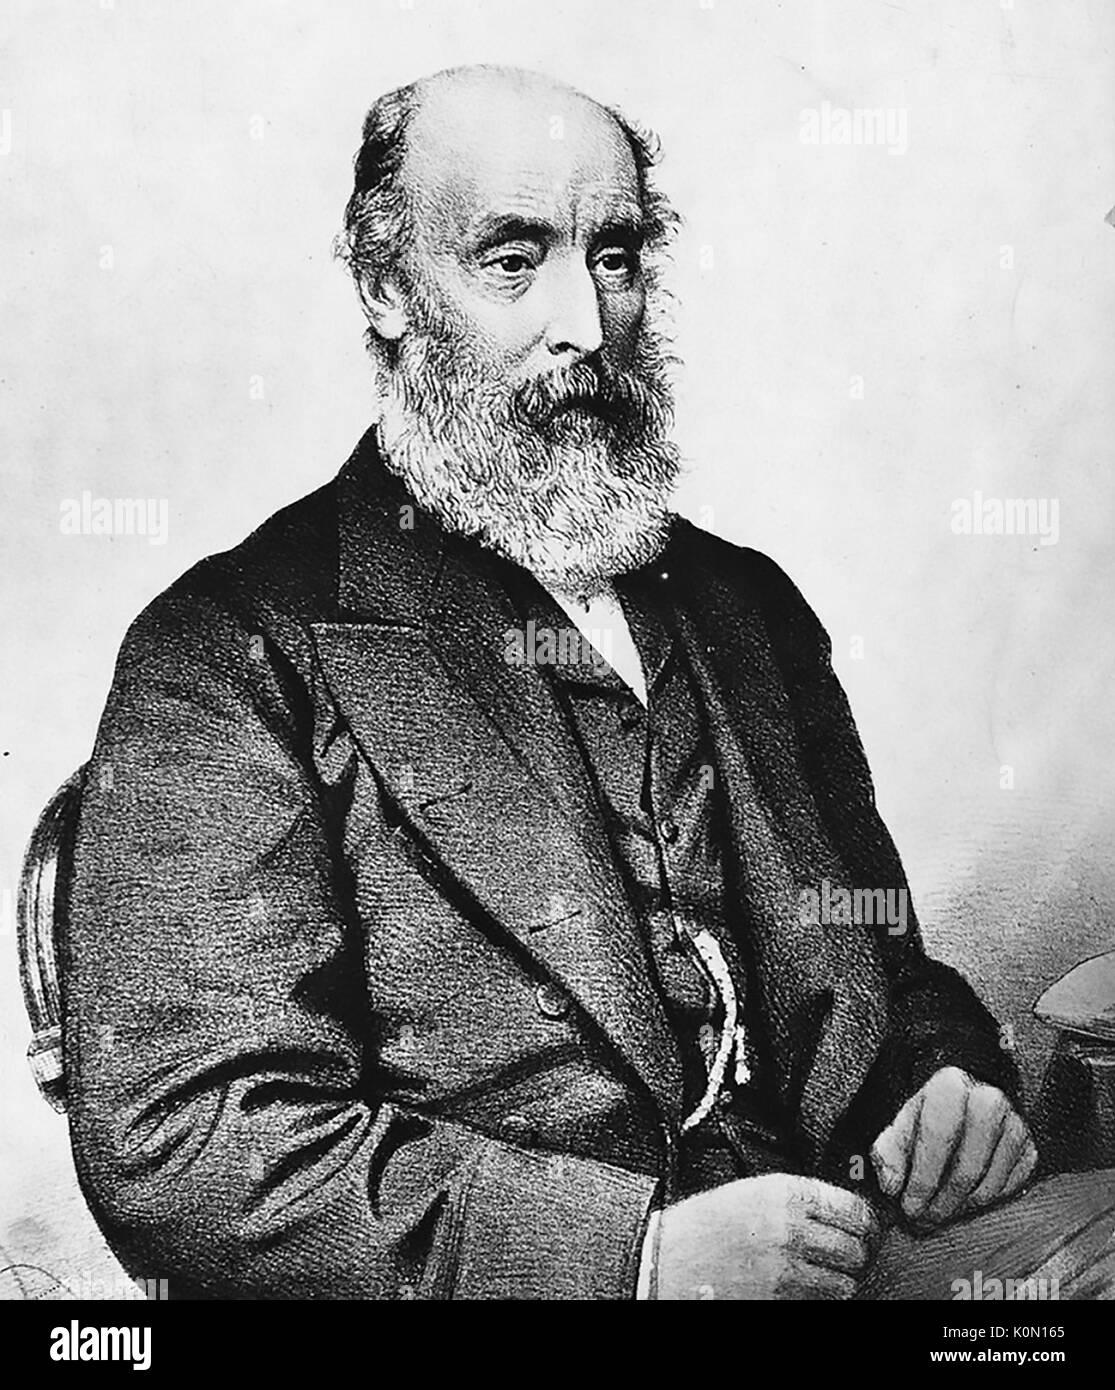 ROBERT RICHARD TORRENS (1814-1884) 3rd Premier of South Australia - Stock Image